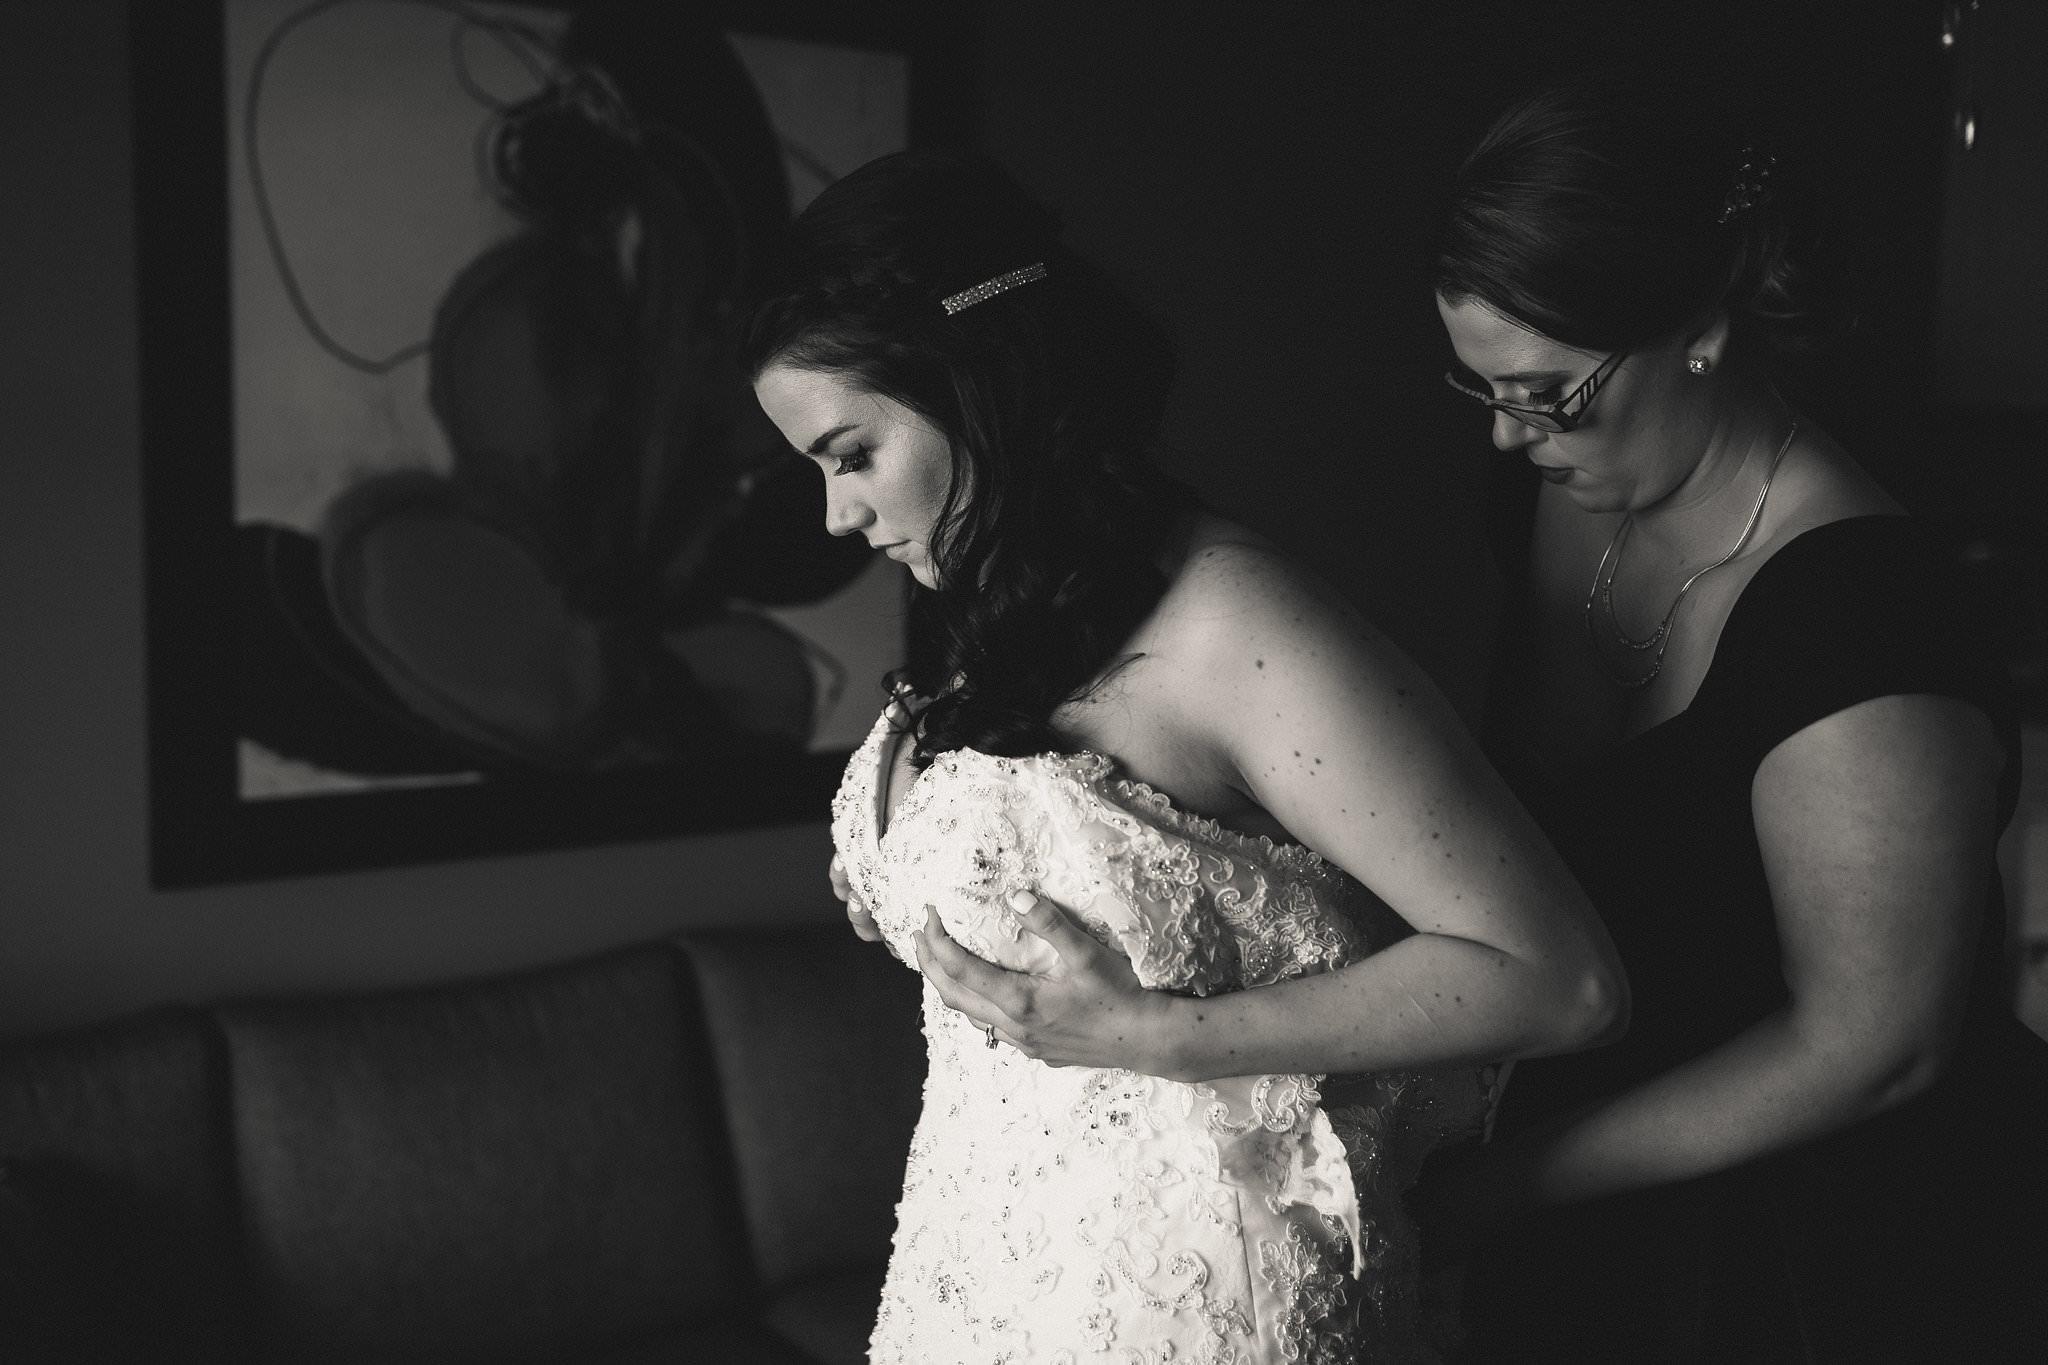 Kristen Adam Kindred Loft Whitby Wedding Photos 45 - Durham Wedding Photographer: Kindred Loft Wedding Photos